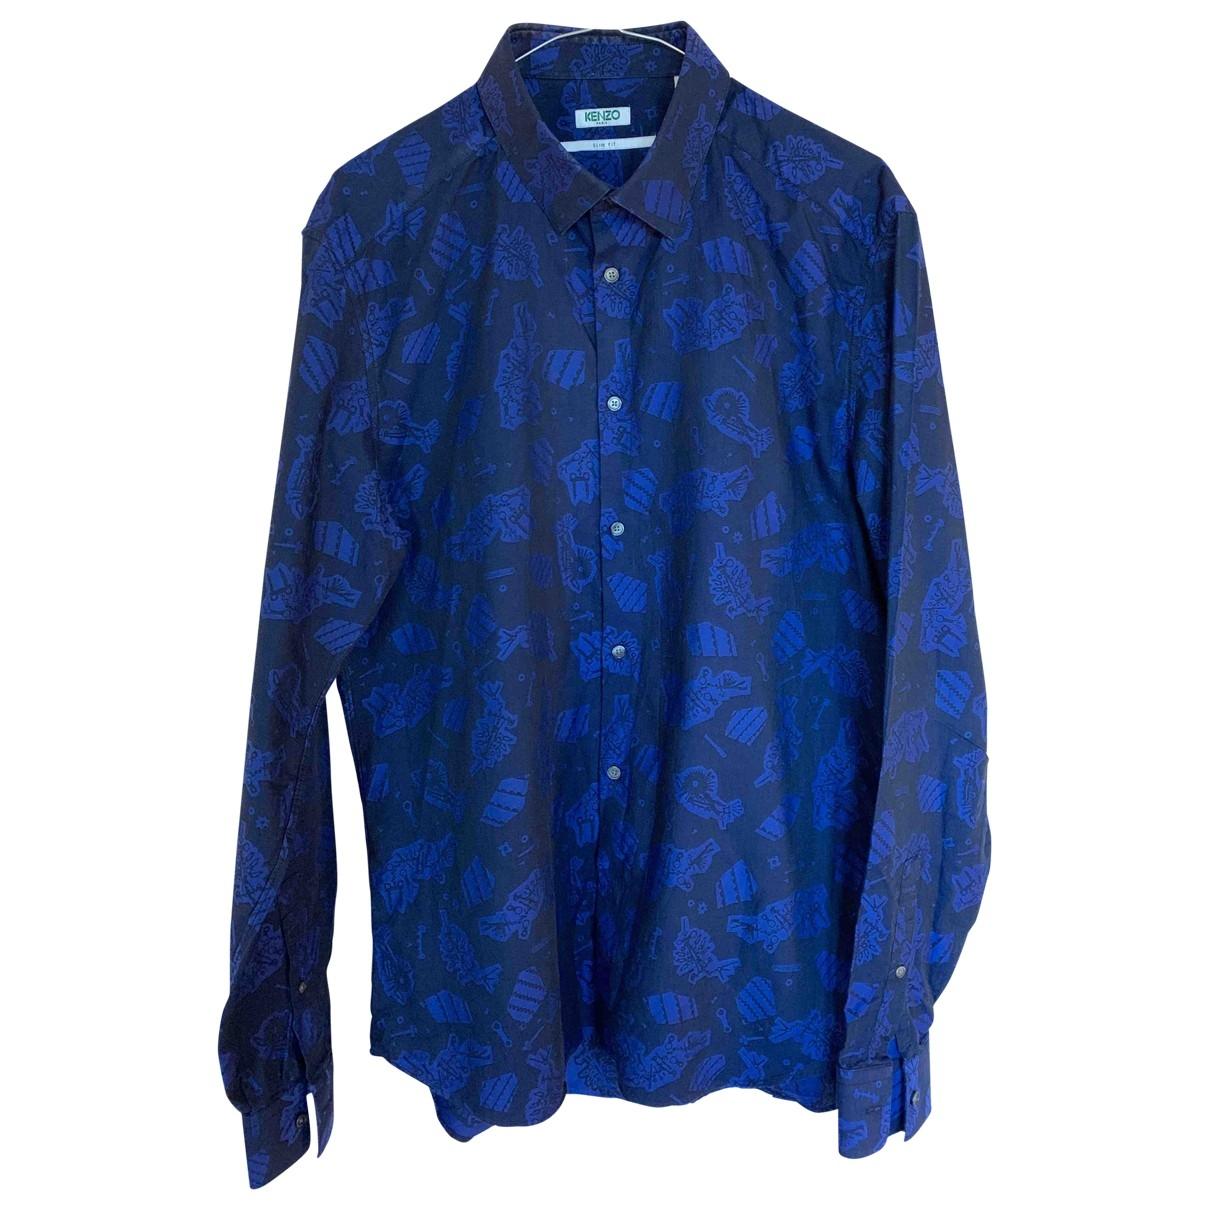 Kenzo \N Navy Cotton Shirts for Men 42 EU (tour de cou / collar)